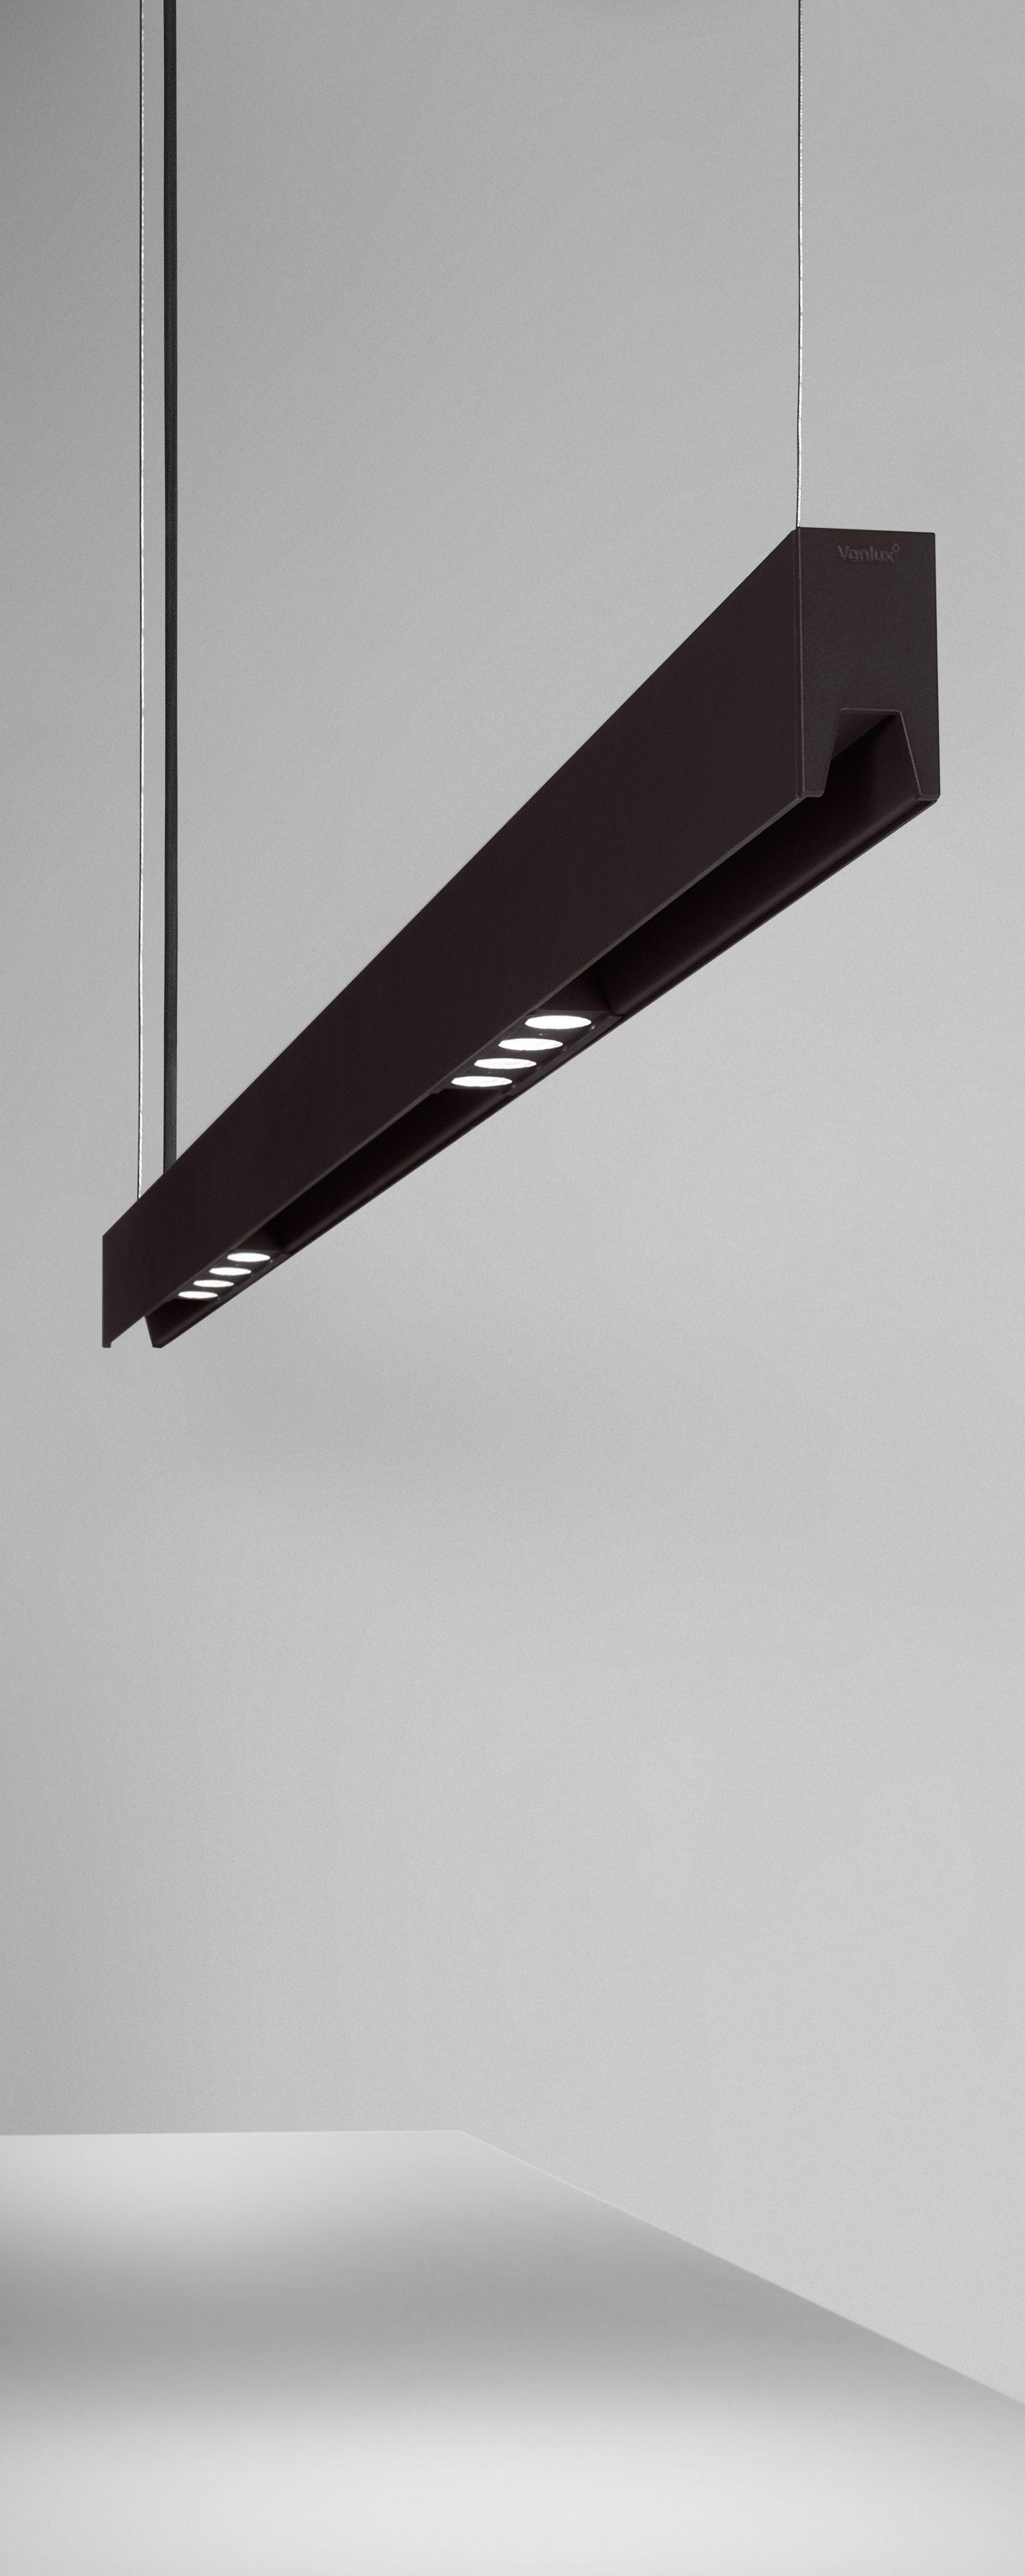 Anvil Led Architectural Lighting System By Davidabad For B Lux Lamparas Linear Lighting Floor Lamp Lighting Lamp